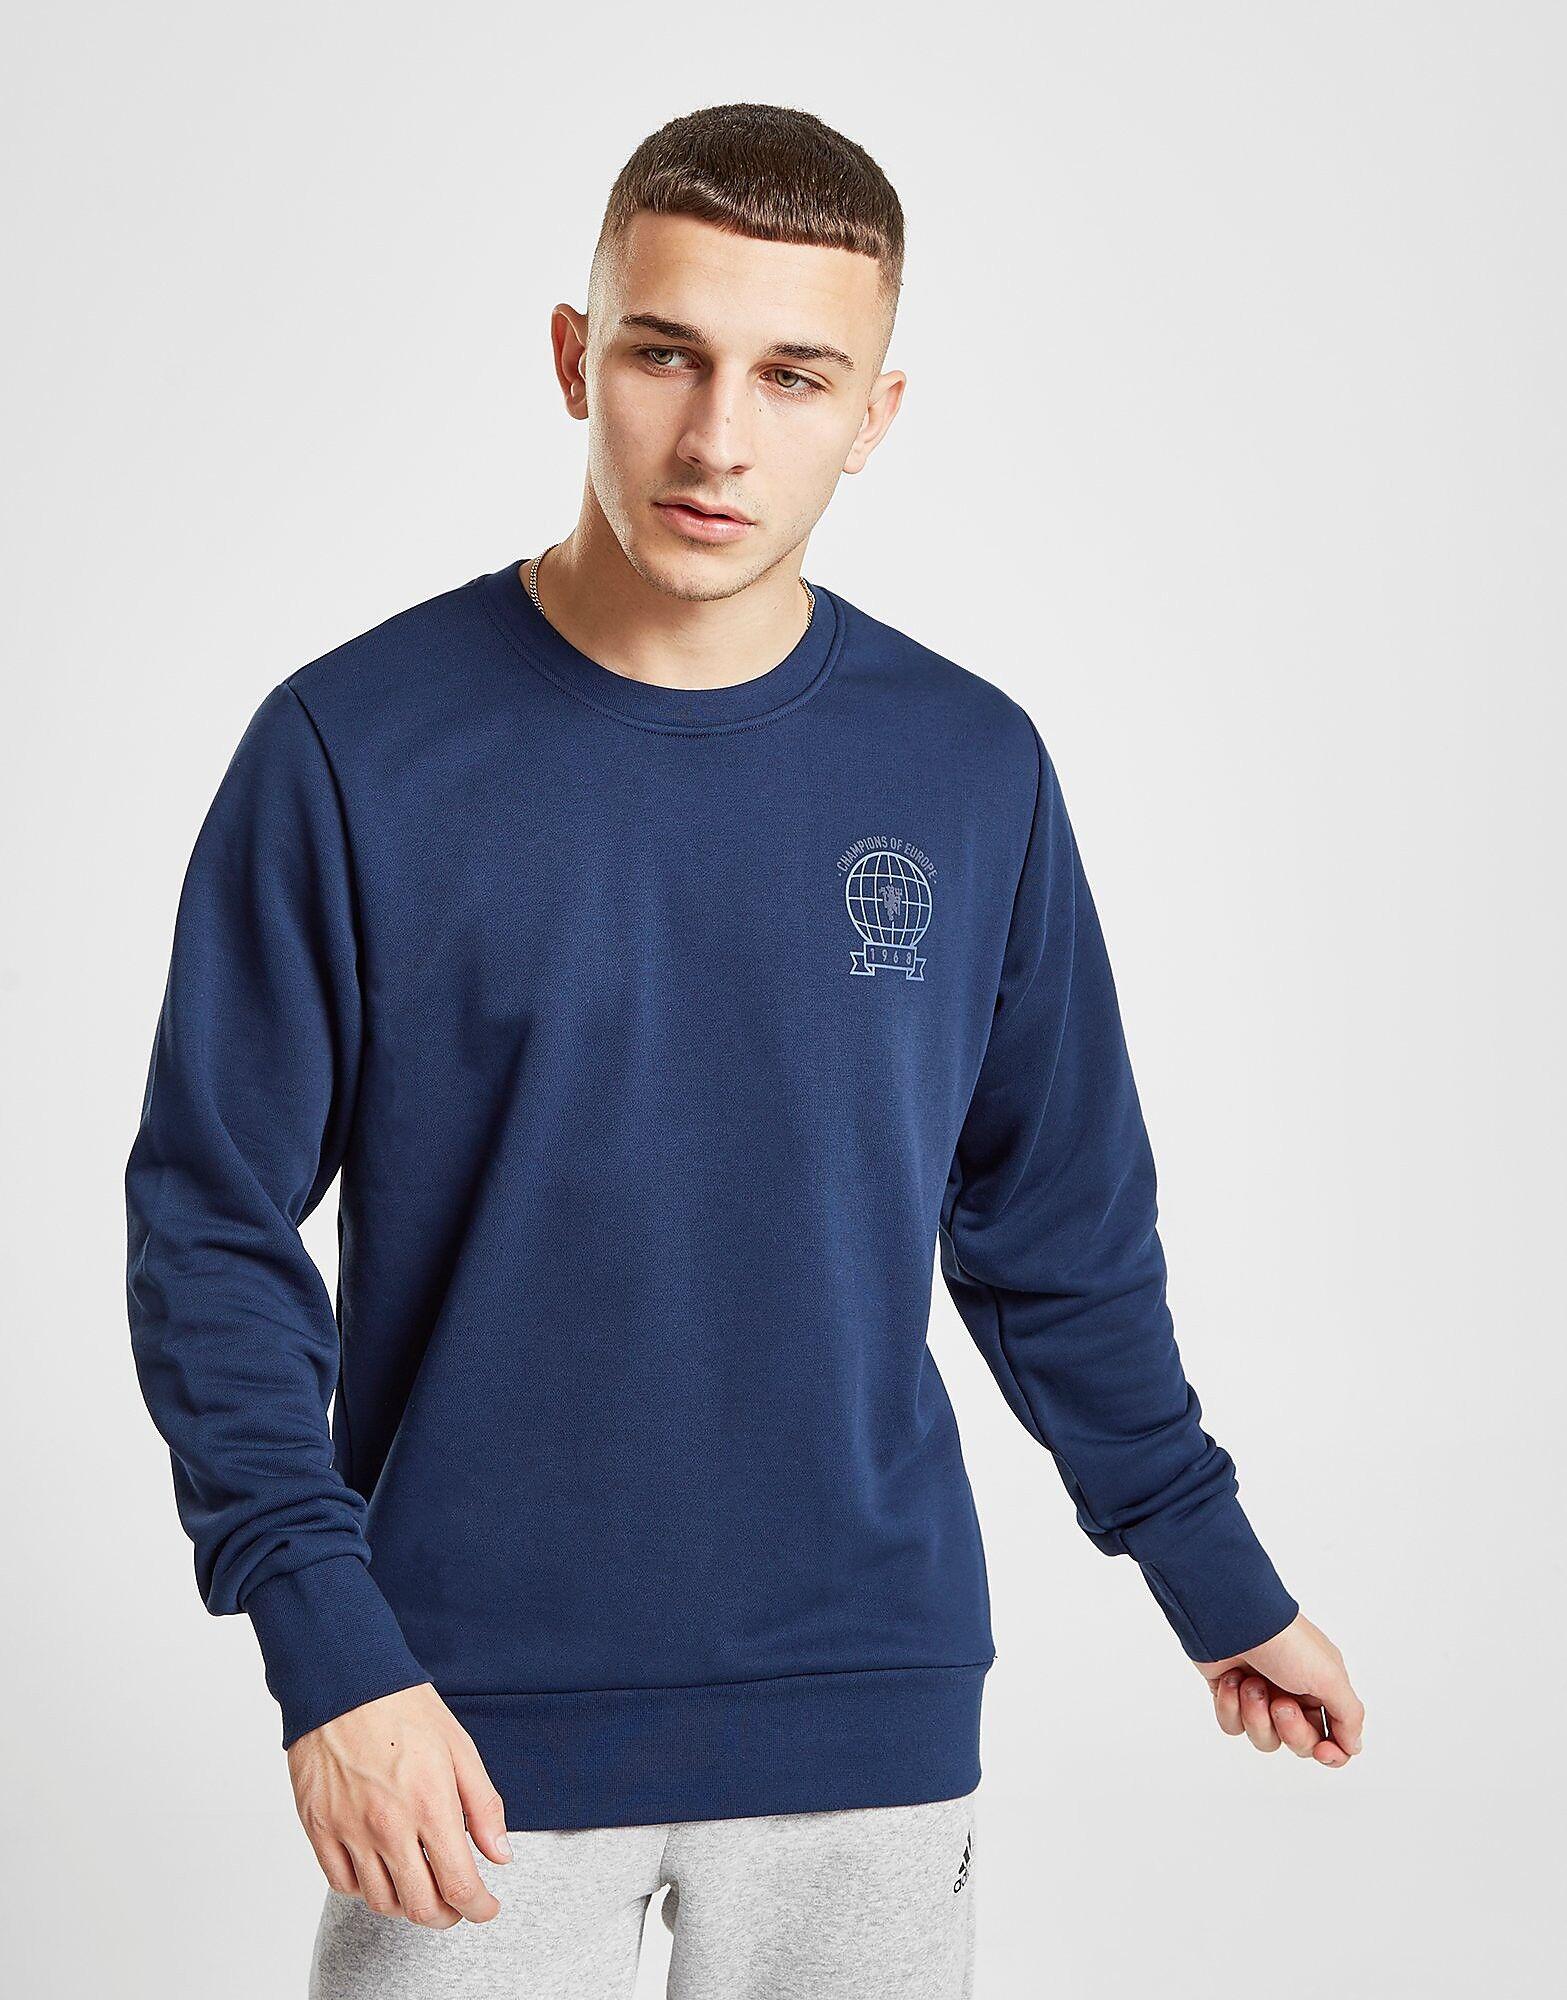 Image of Adidas Manchester United FC Crew Sweatshirt - Mens, Laivastonsininen